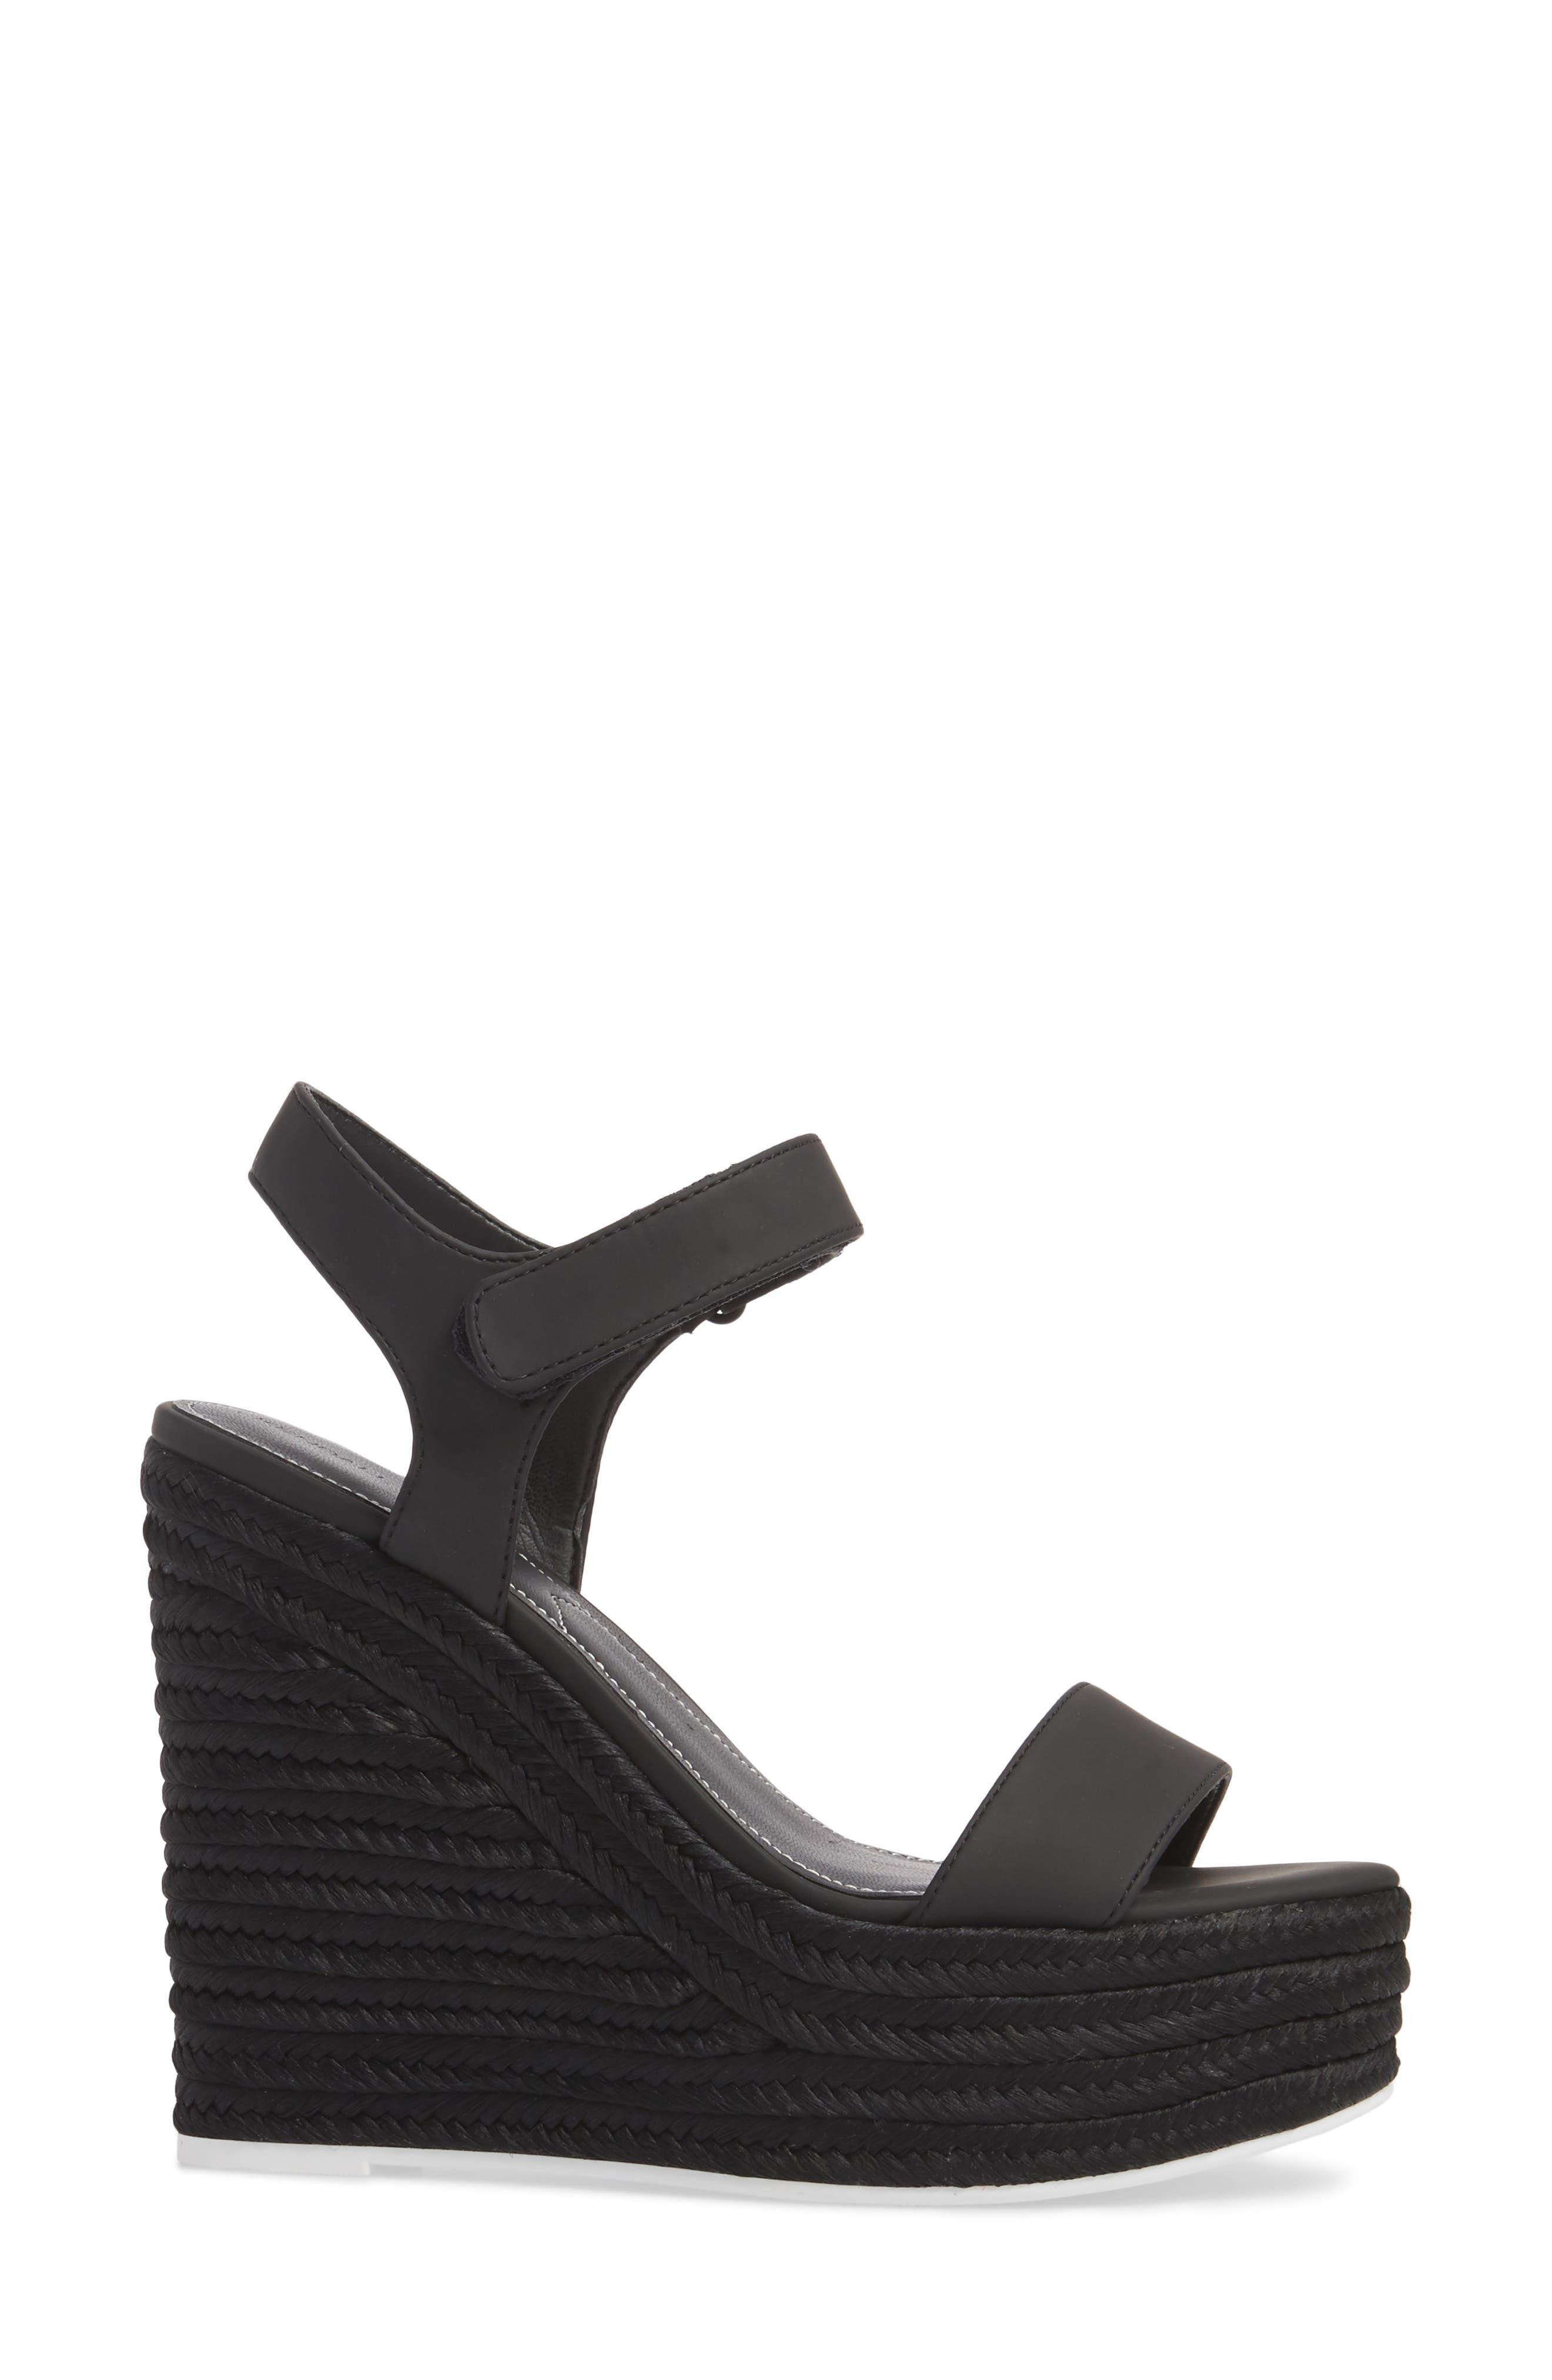 Grand Sport Espadrille Wedge Sandal,                             Alternate thumbnail 3, color,                             BLACK